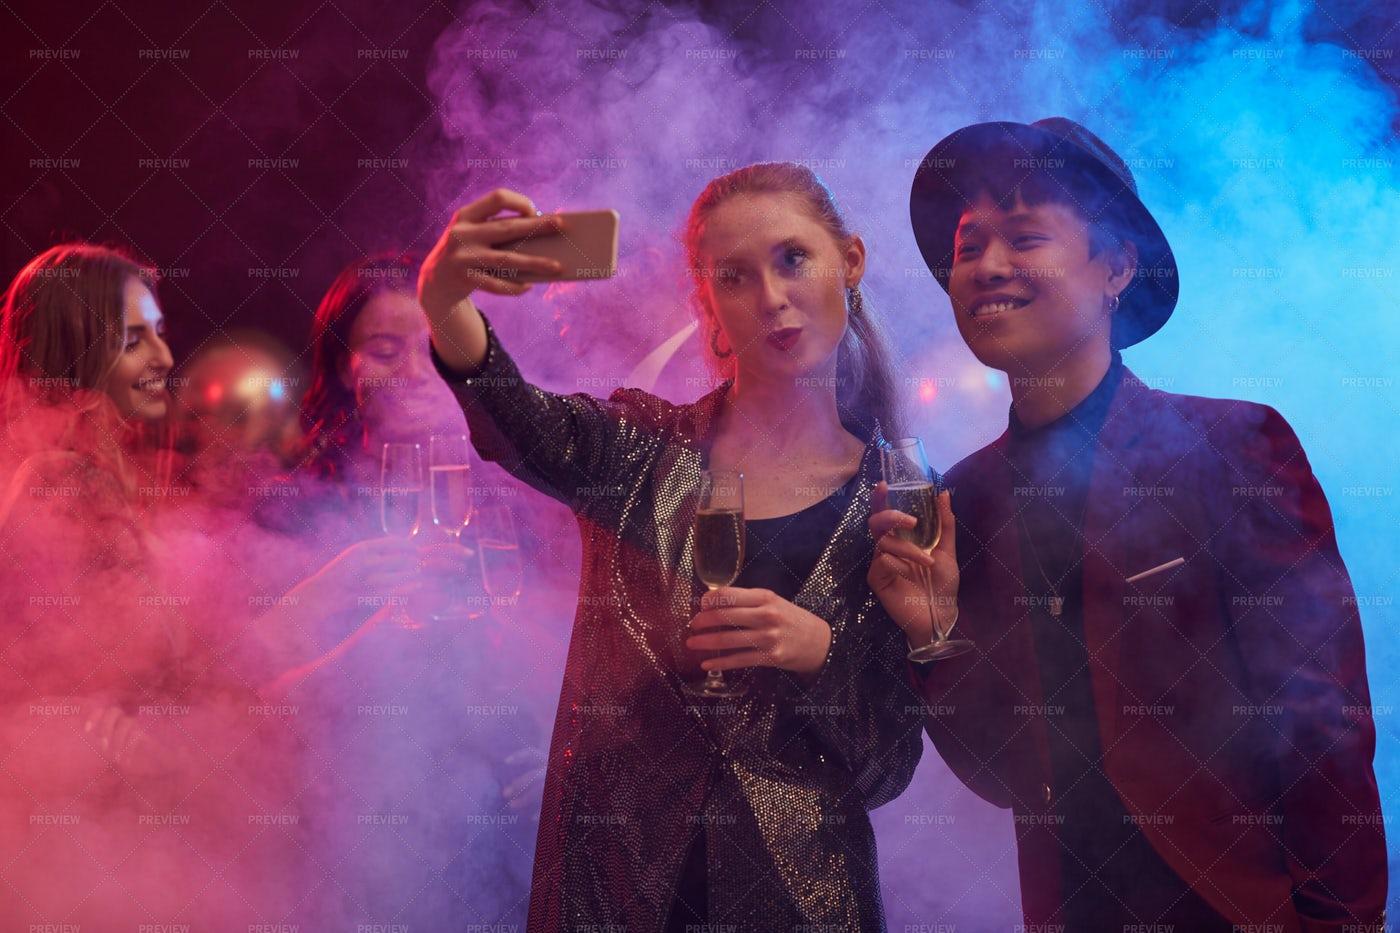 Couple Taking Selfie In Nightclub: Stock Photos